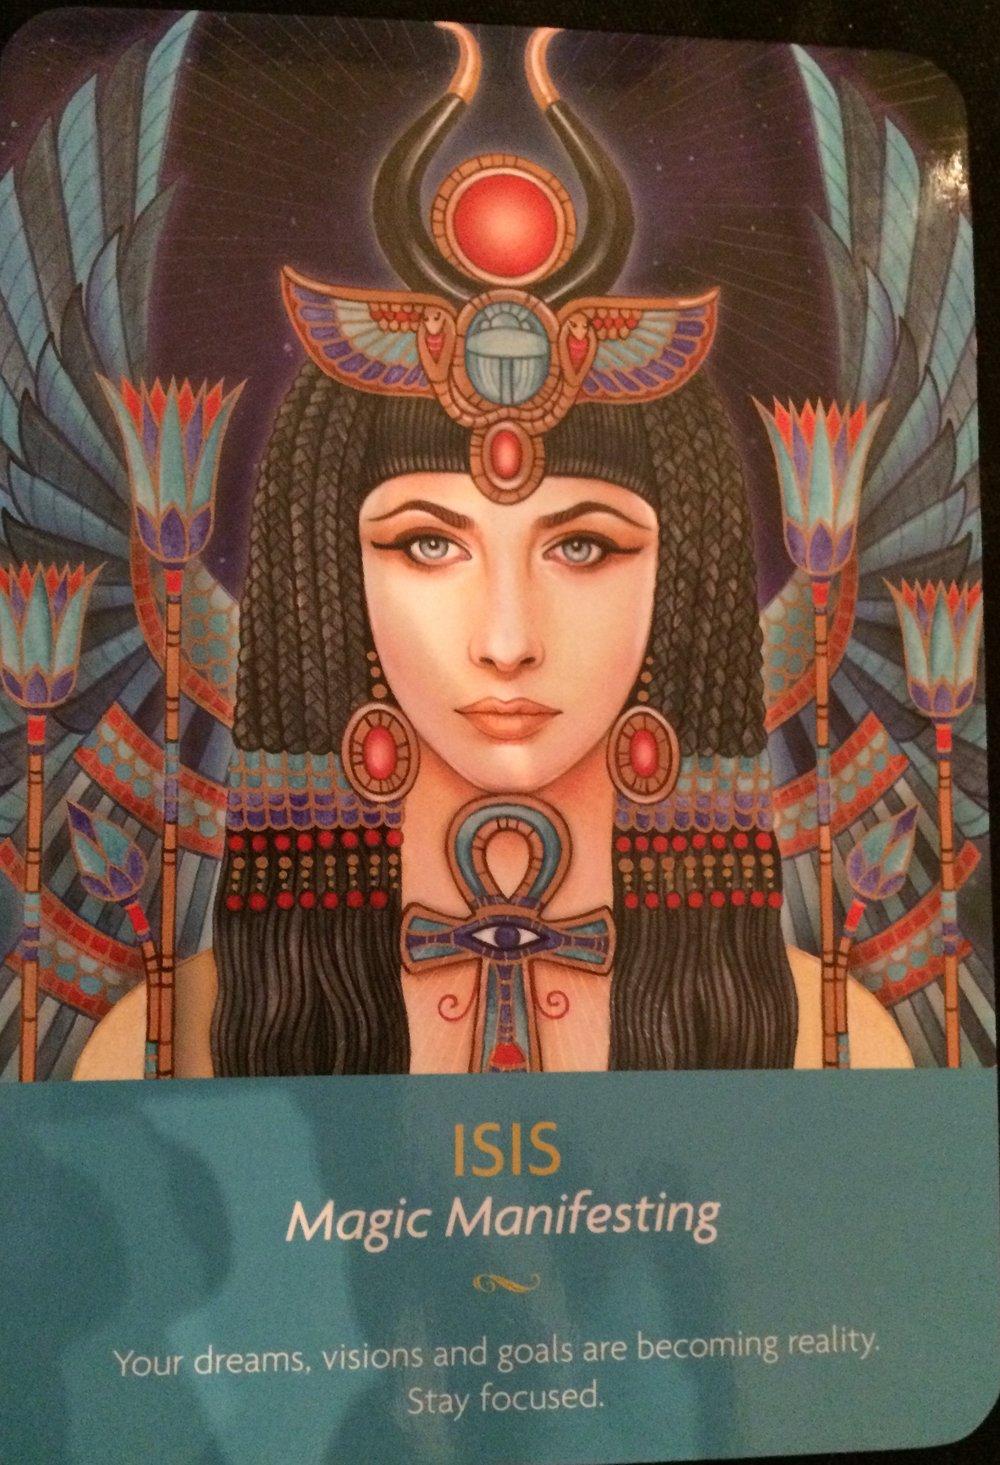 Isis - Magic Manifesting